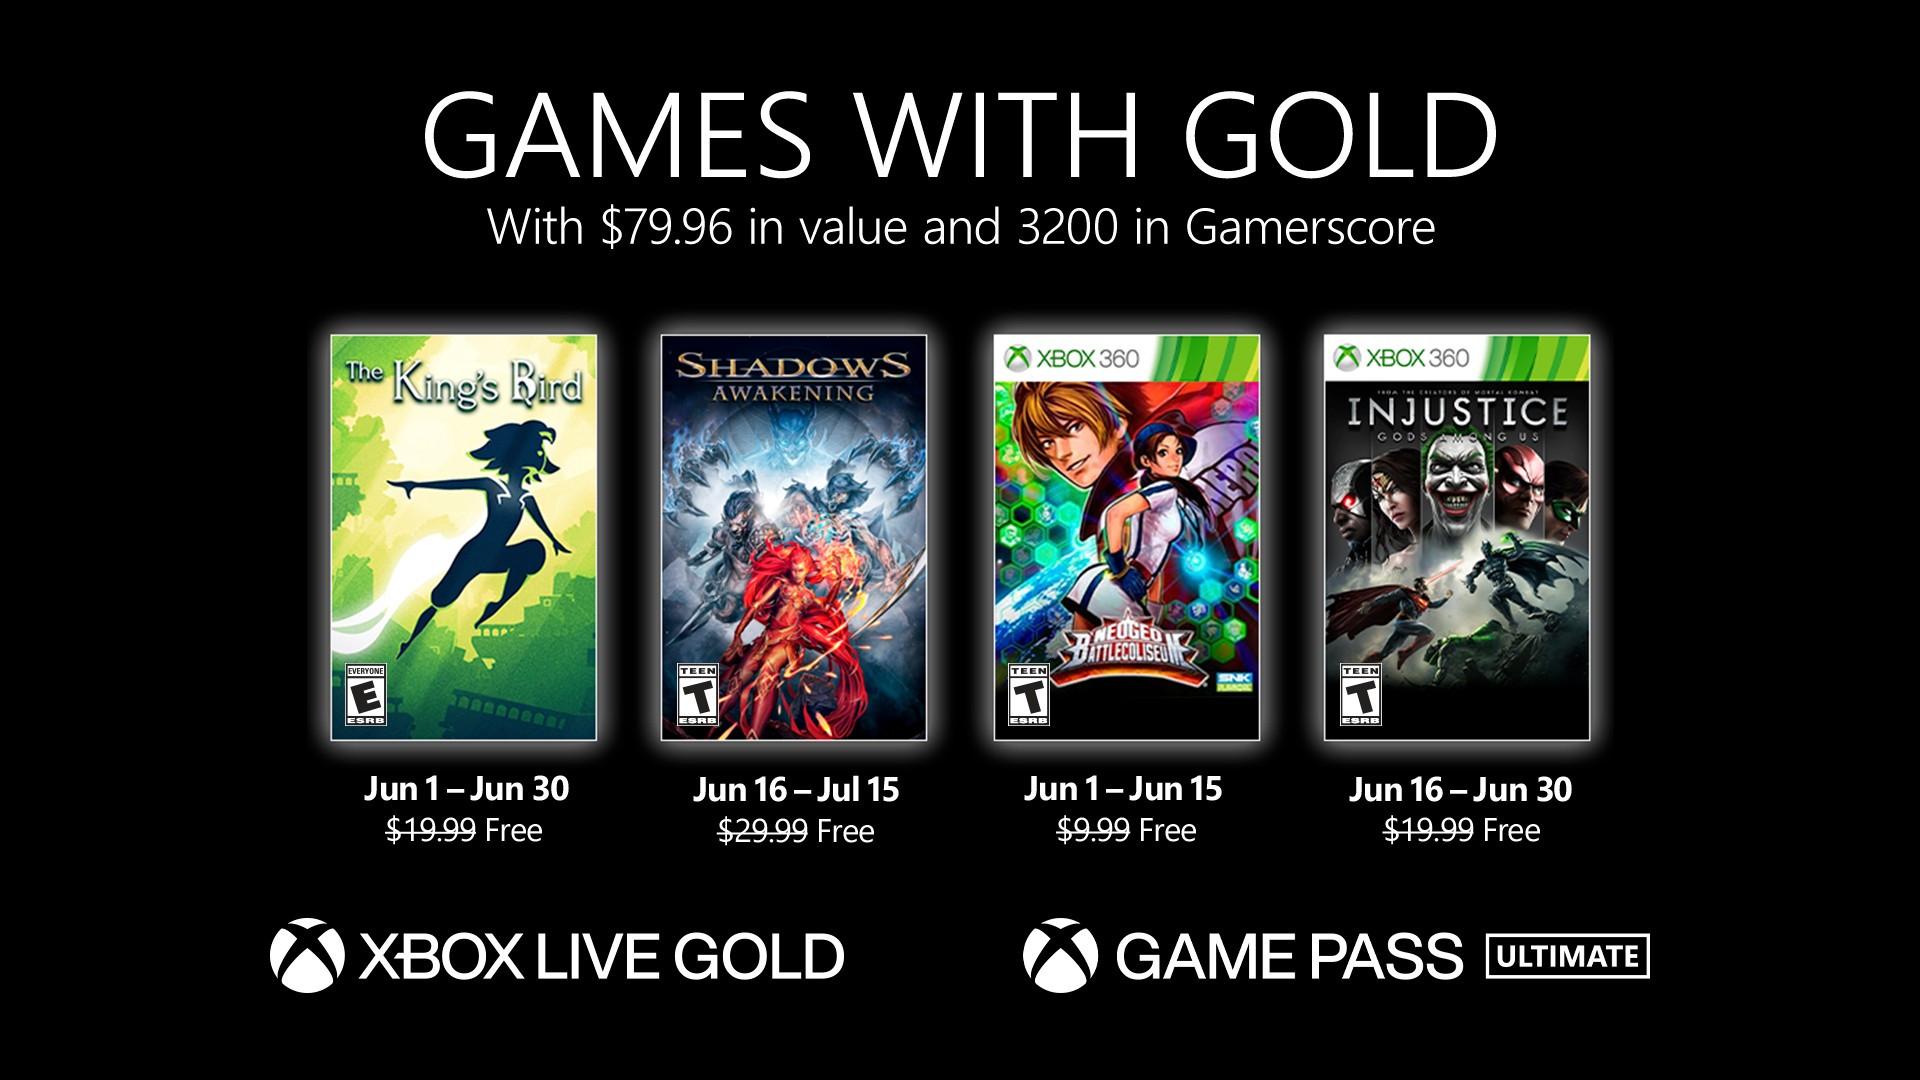 Xbox Games with Gold (June 21) - The King's Bird, Shadows Awakening, NeoGeo Battle Coliseum & Injustice Gods Among Us